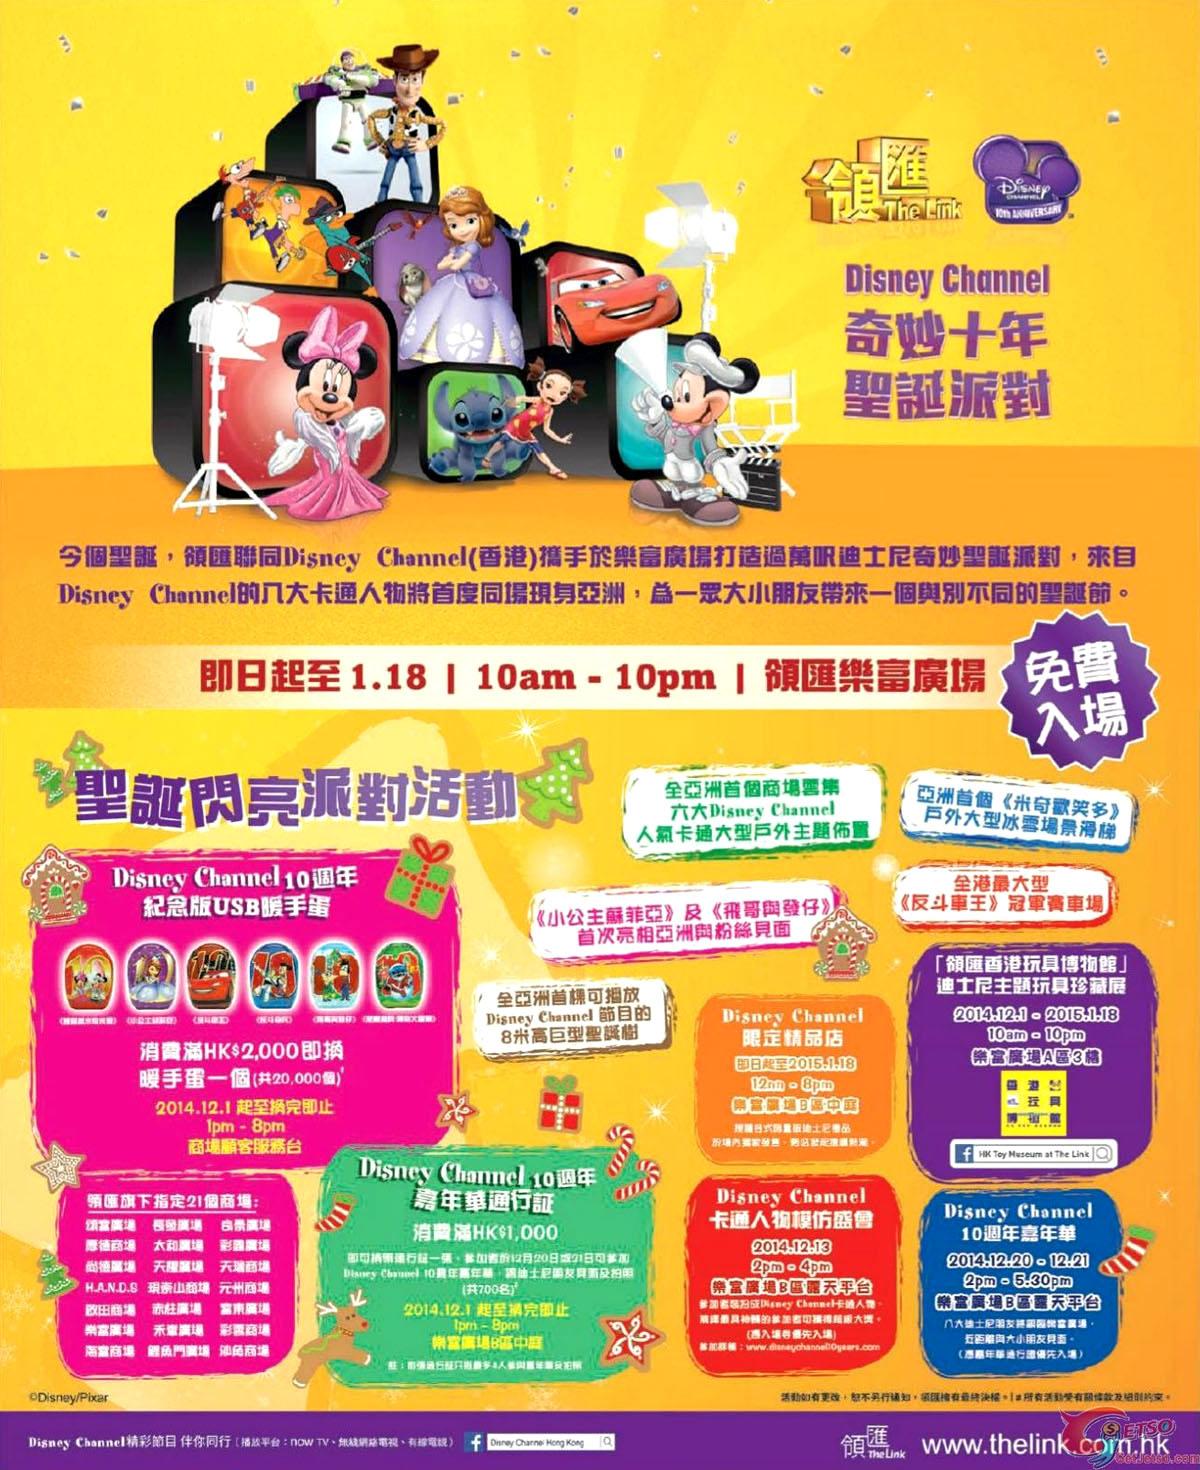 領匯樂富香港迪士尼hk disney channel奇妙十年聖誕派對the link lok fu  hk disney channel christmas promotion discount package price